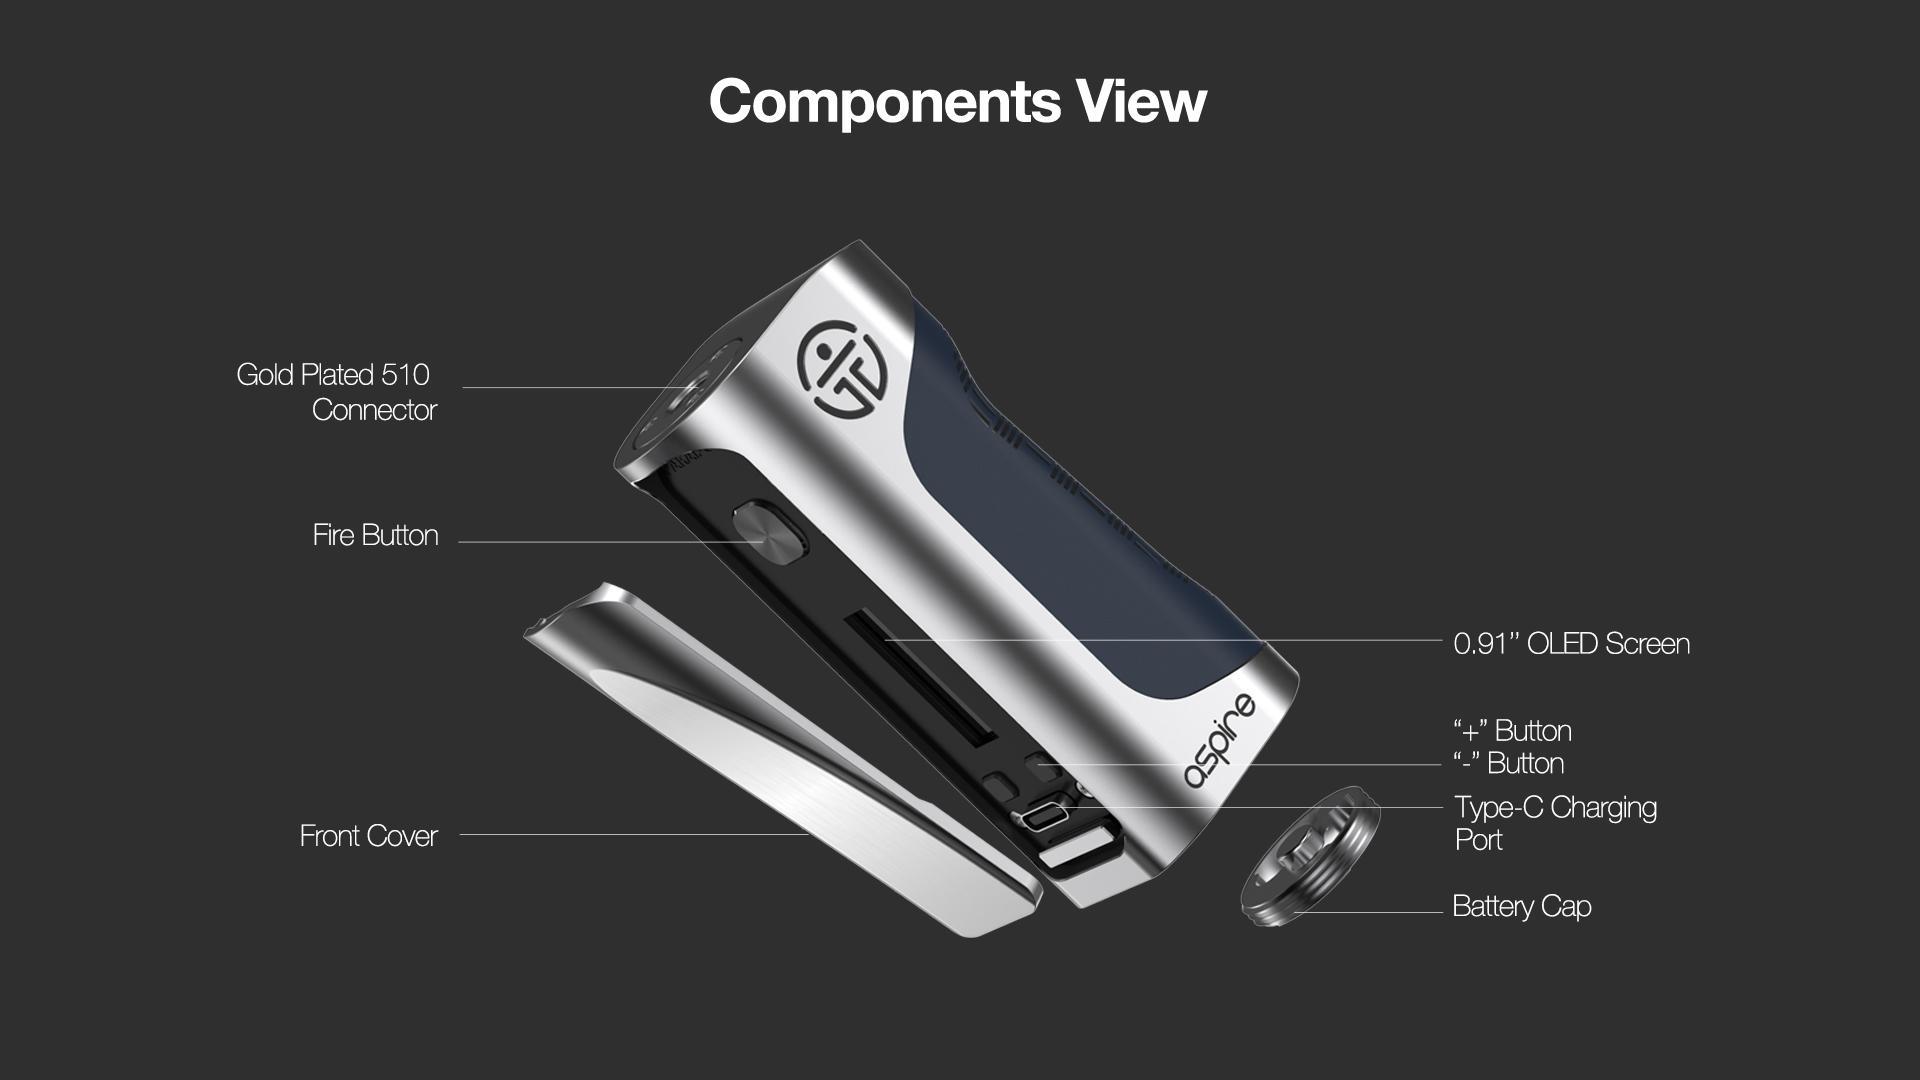 Componentes de Aspire Paradox Mod: